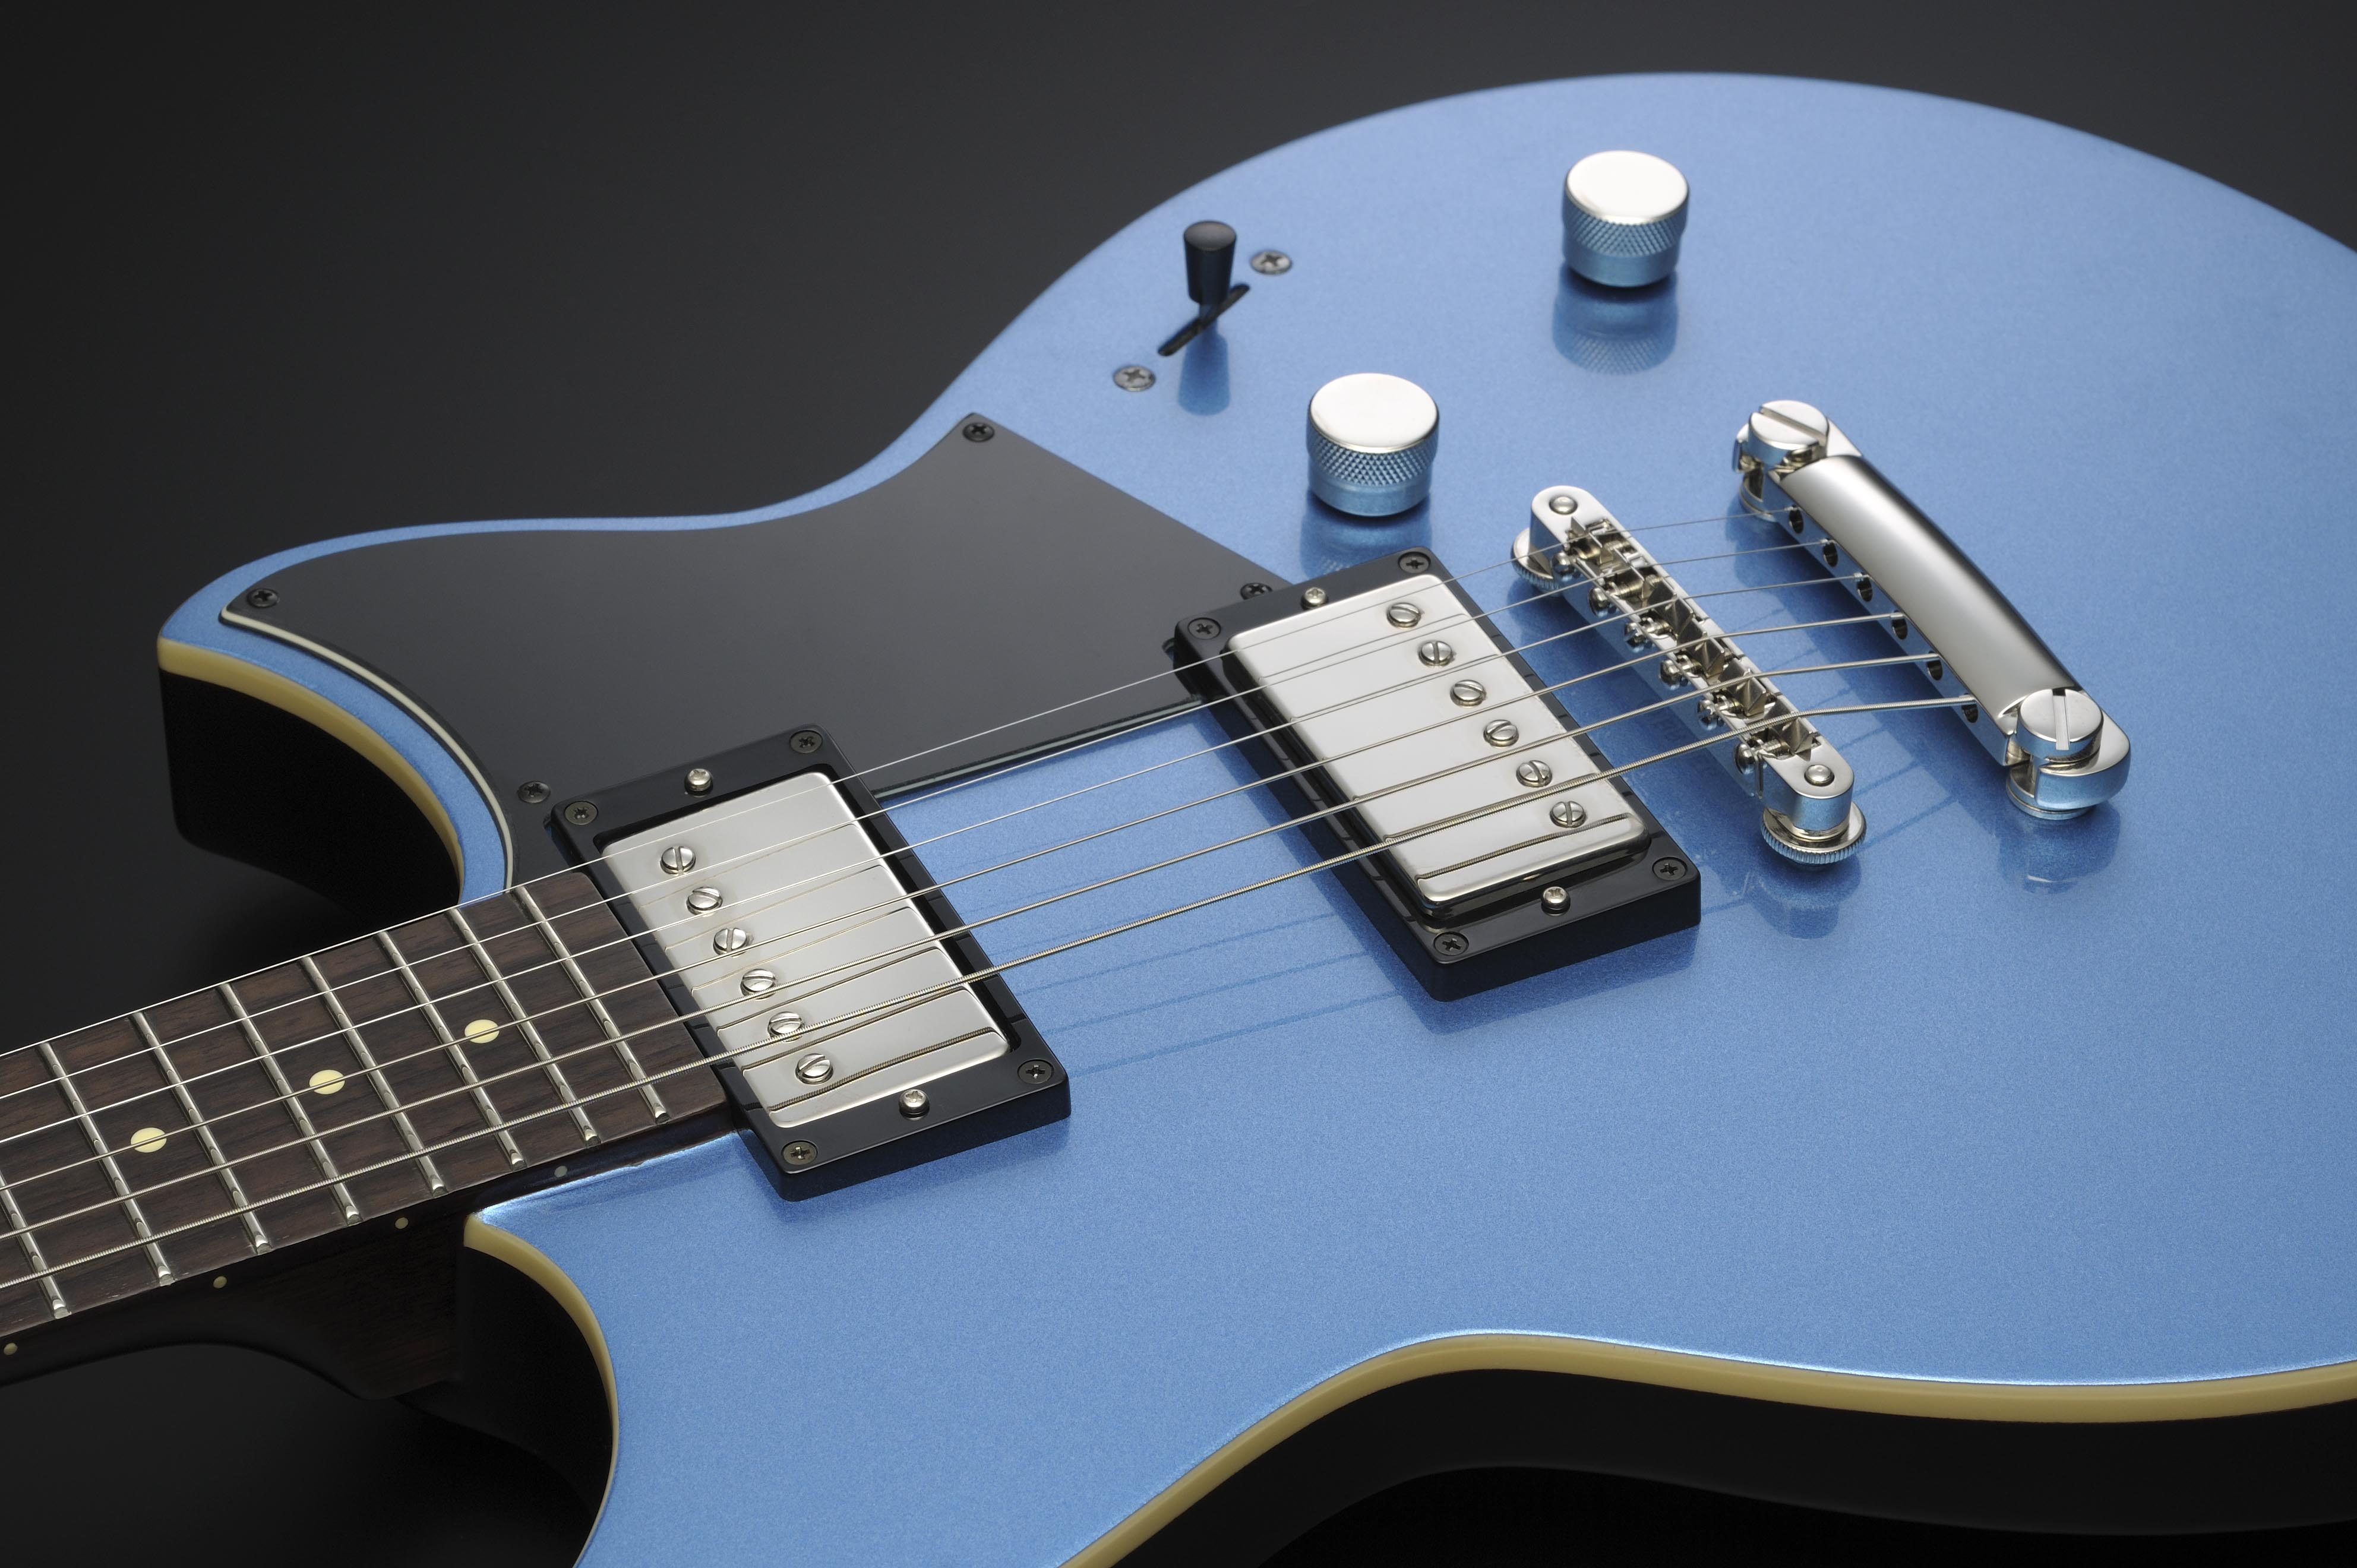 yamaha revstar rs420 electric guitar factory blue yamaha music london. Black Bedroom Furniture Sets. Home Design Ideas